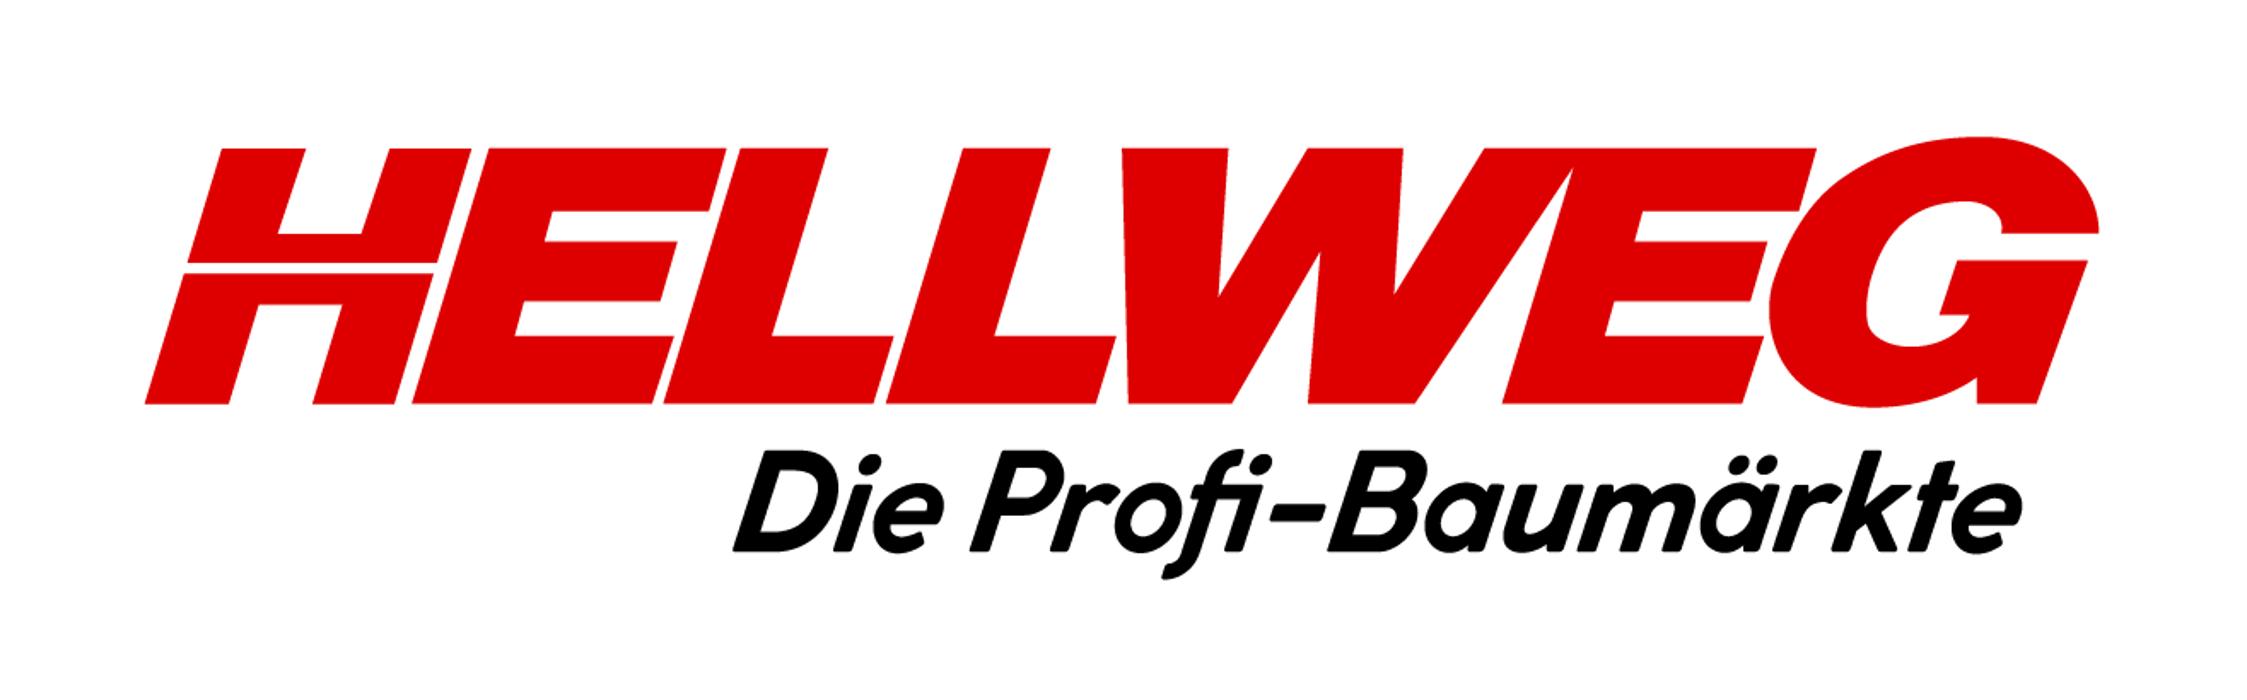 Bild zu HELLWEG - Die Profi-Baumärkte Bochum in Bochum